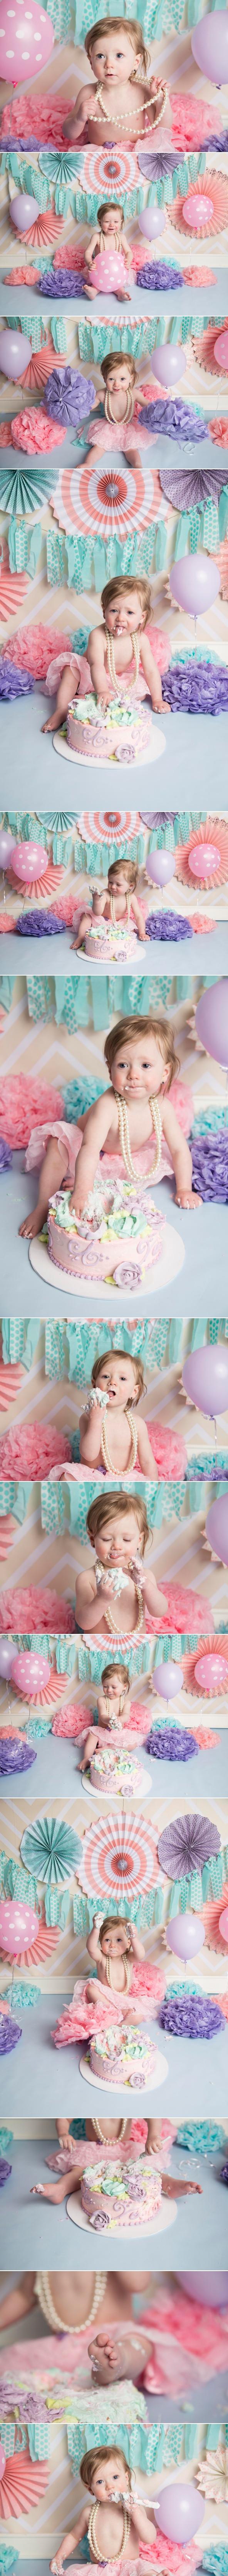 cake smash photographer regina